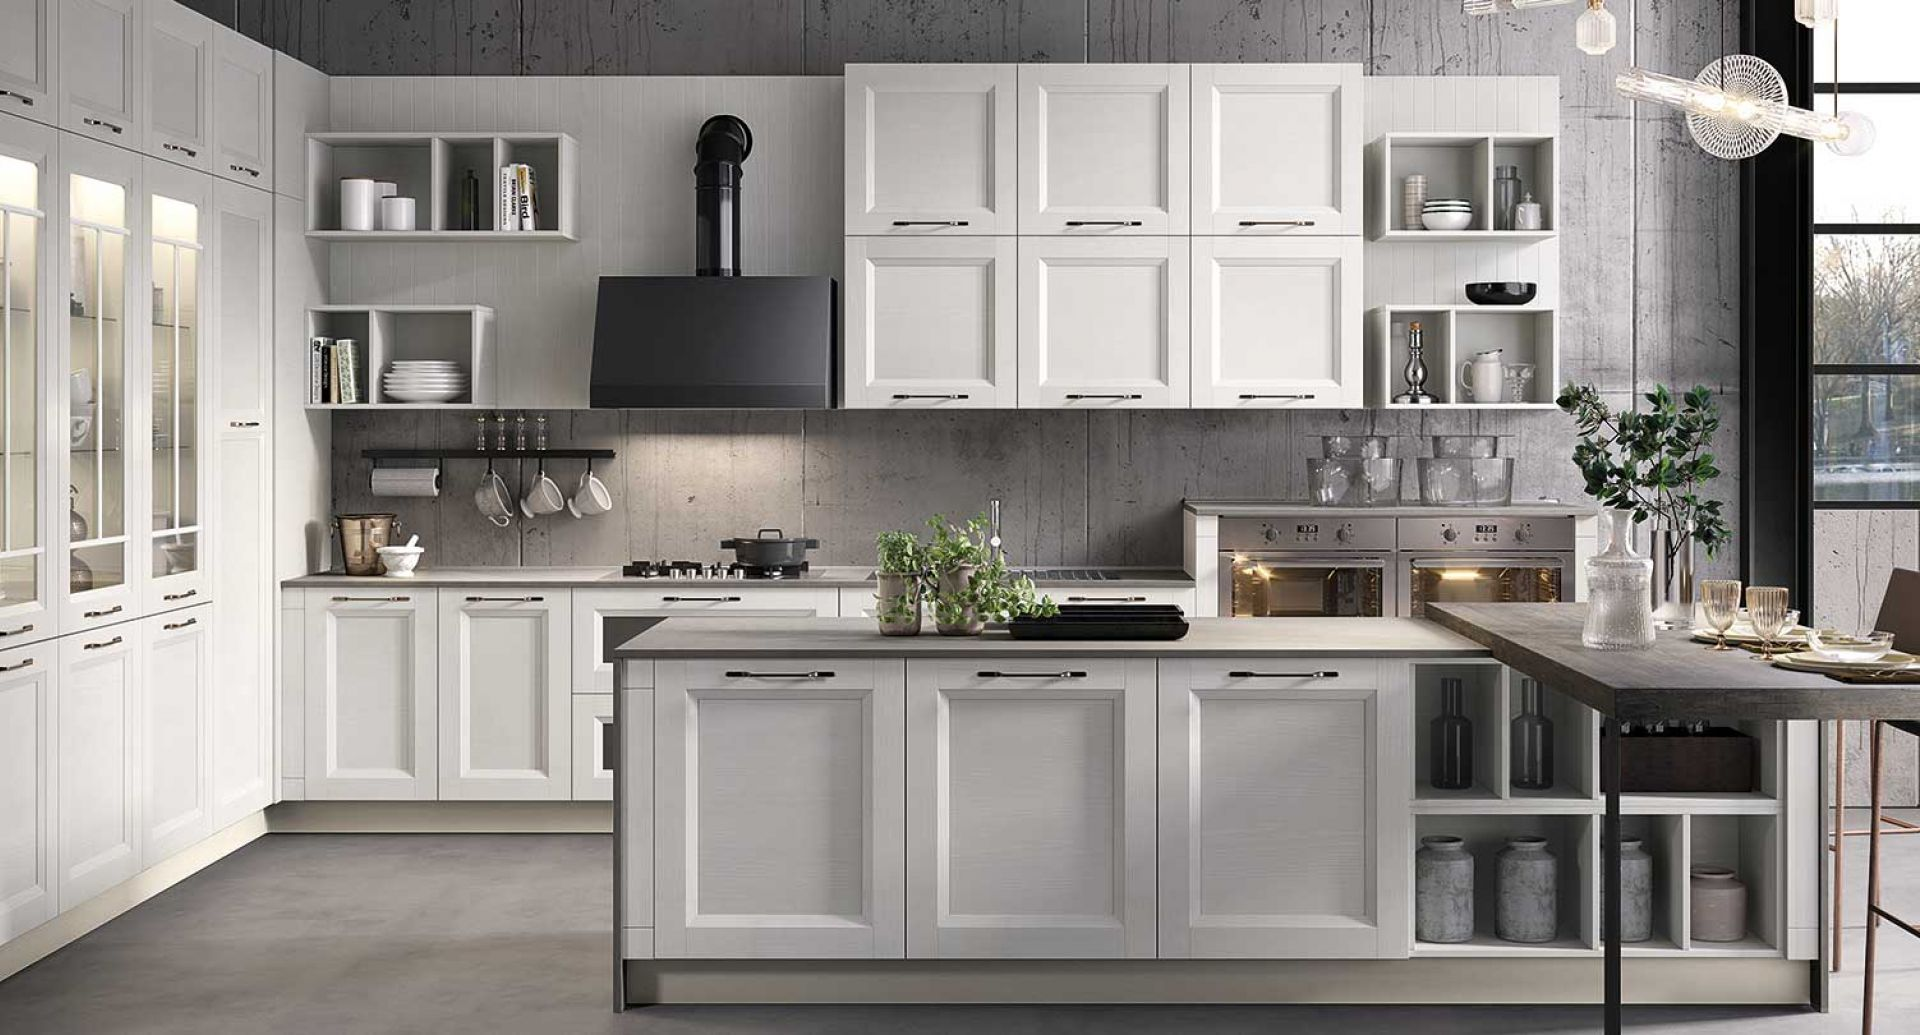 evo-cucina-gea-bianco-02